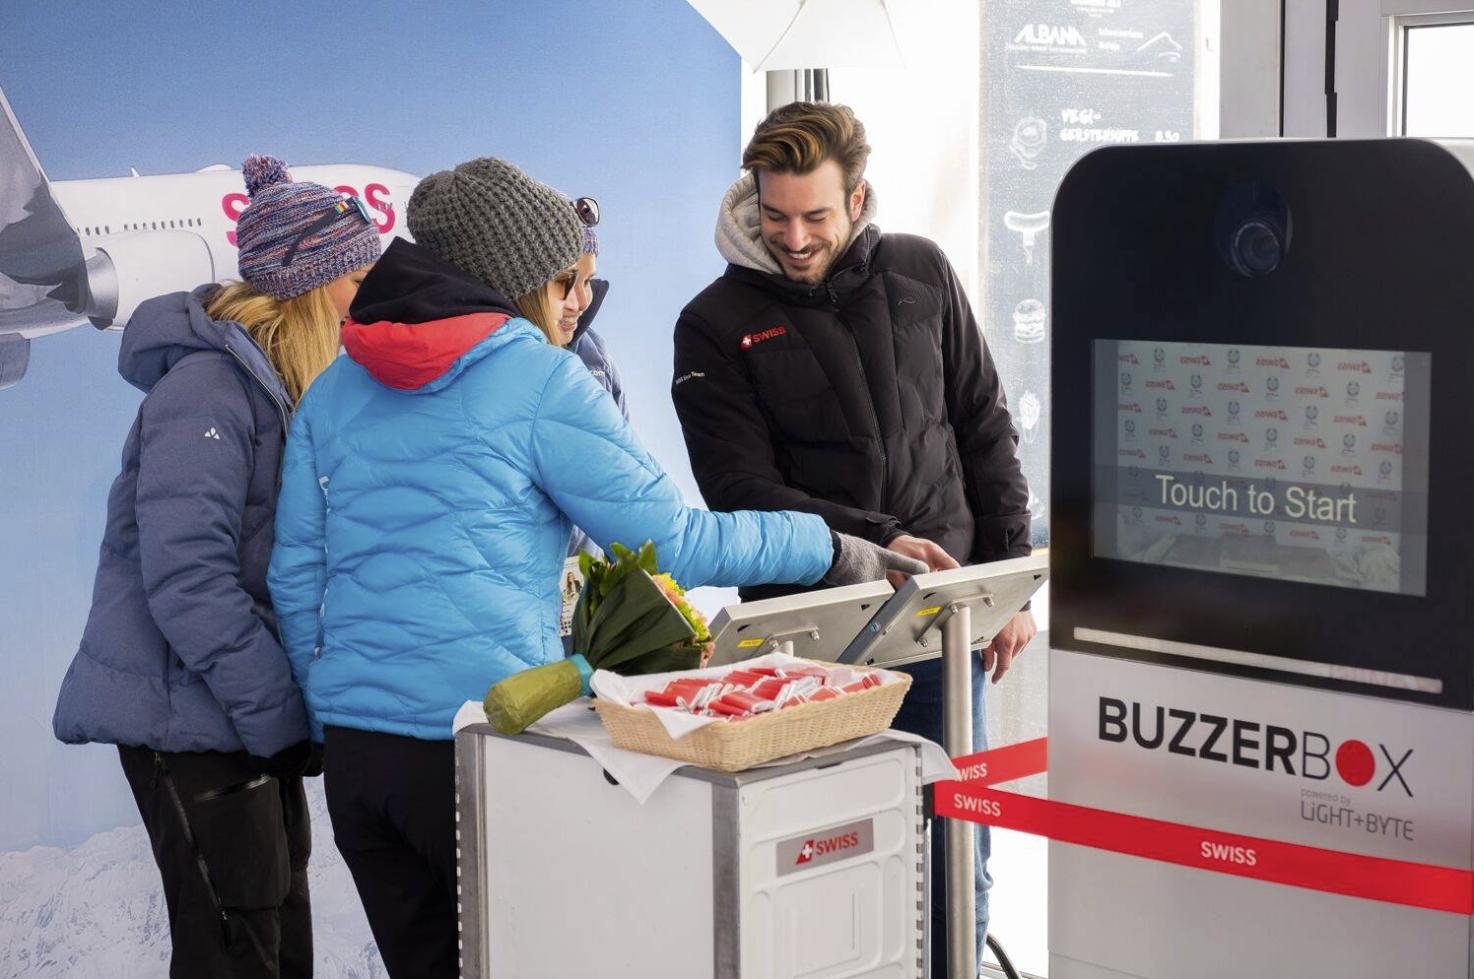 Swiss Int. Airlines, Ski Wm St.Moritz